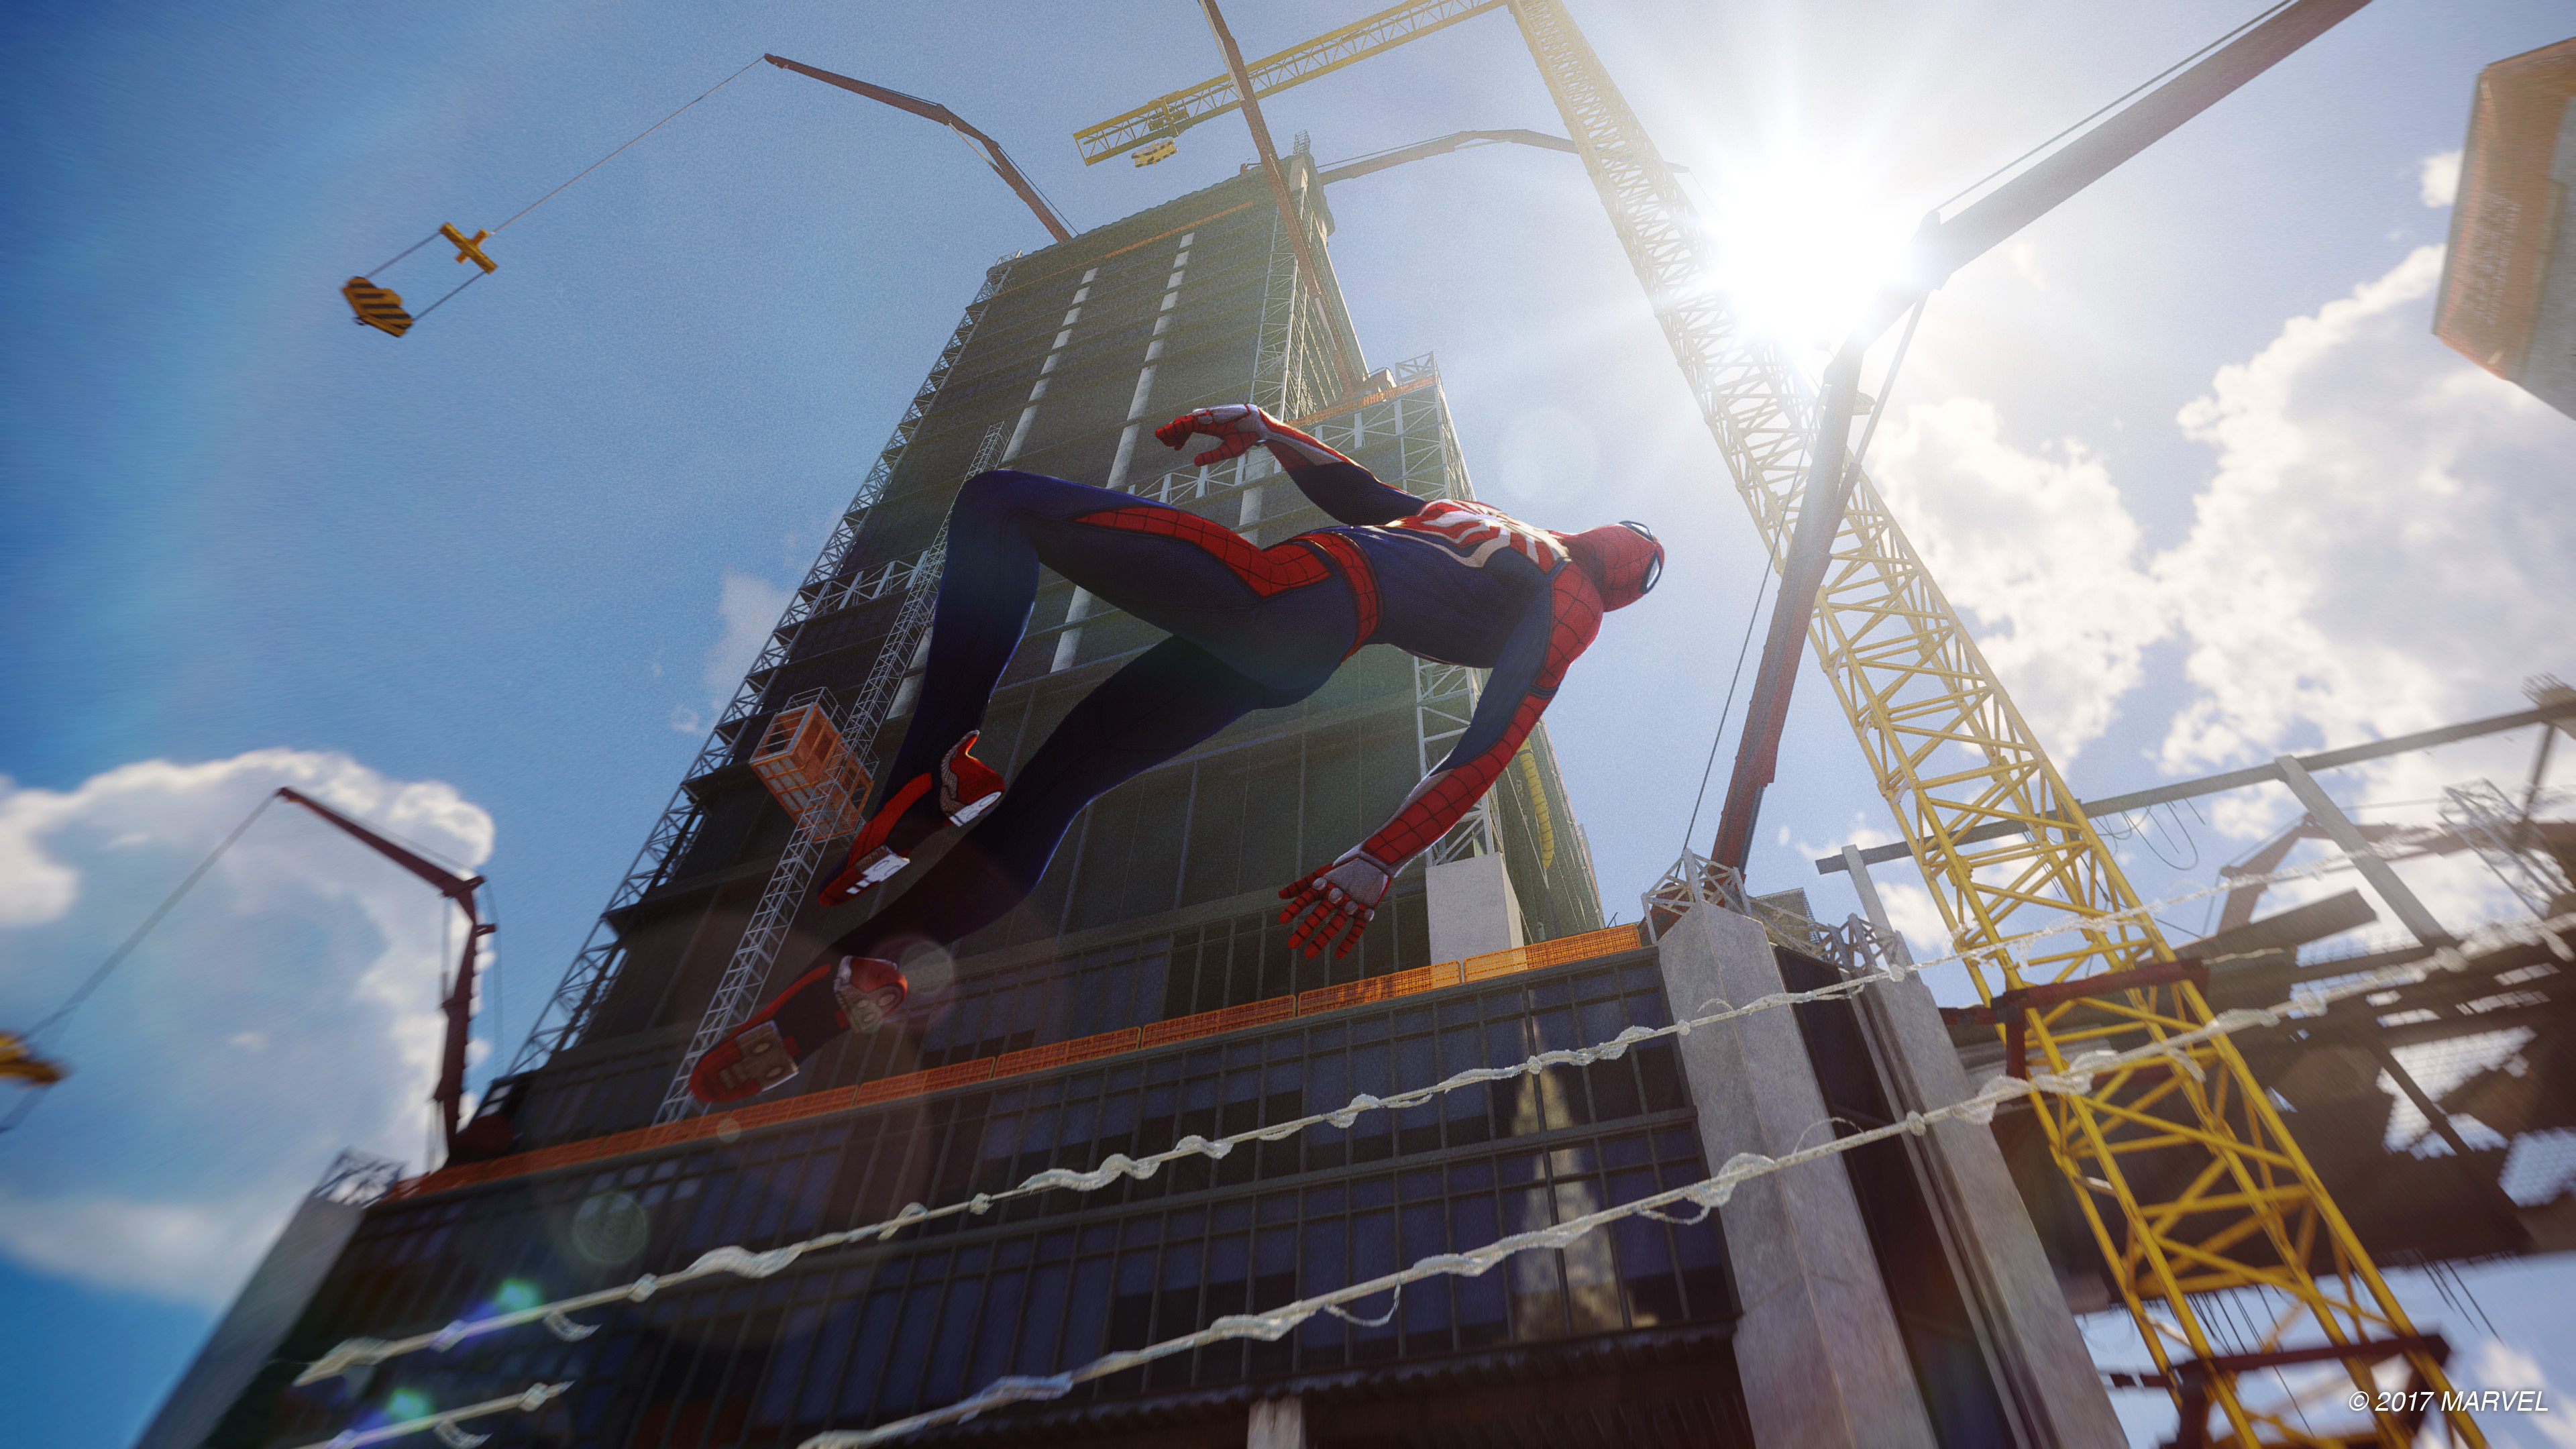 Download 3840x2400 Wallpaper Spider-man Ps4 Pro, Video